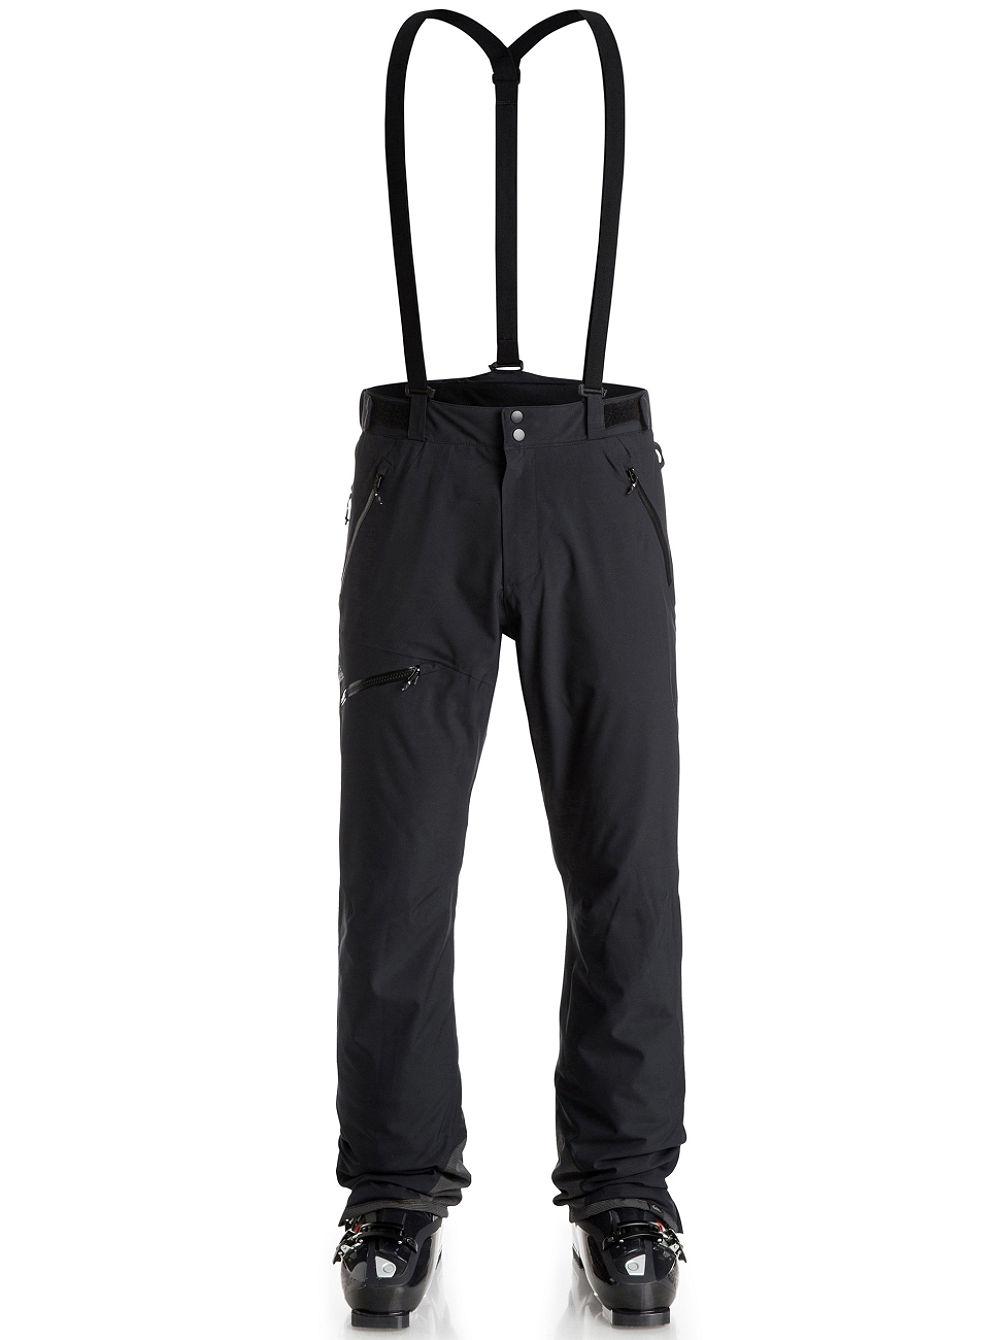 orbitor-pants